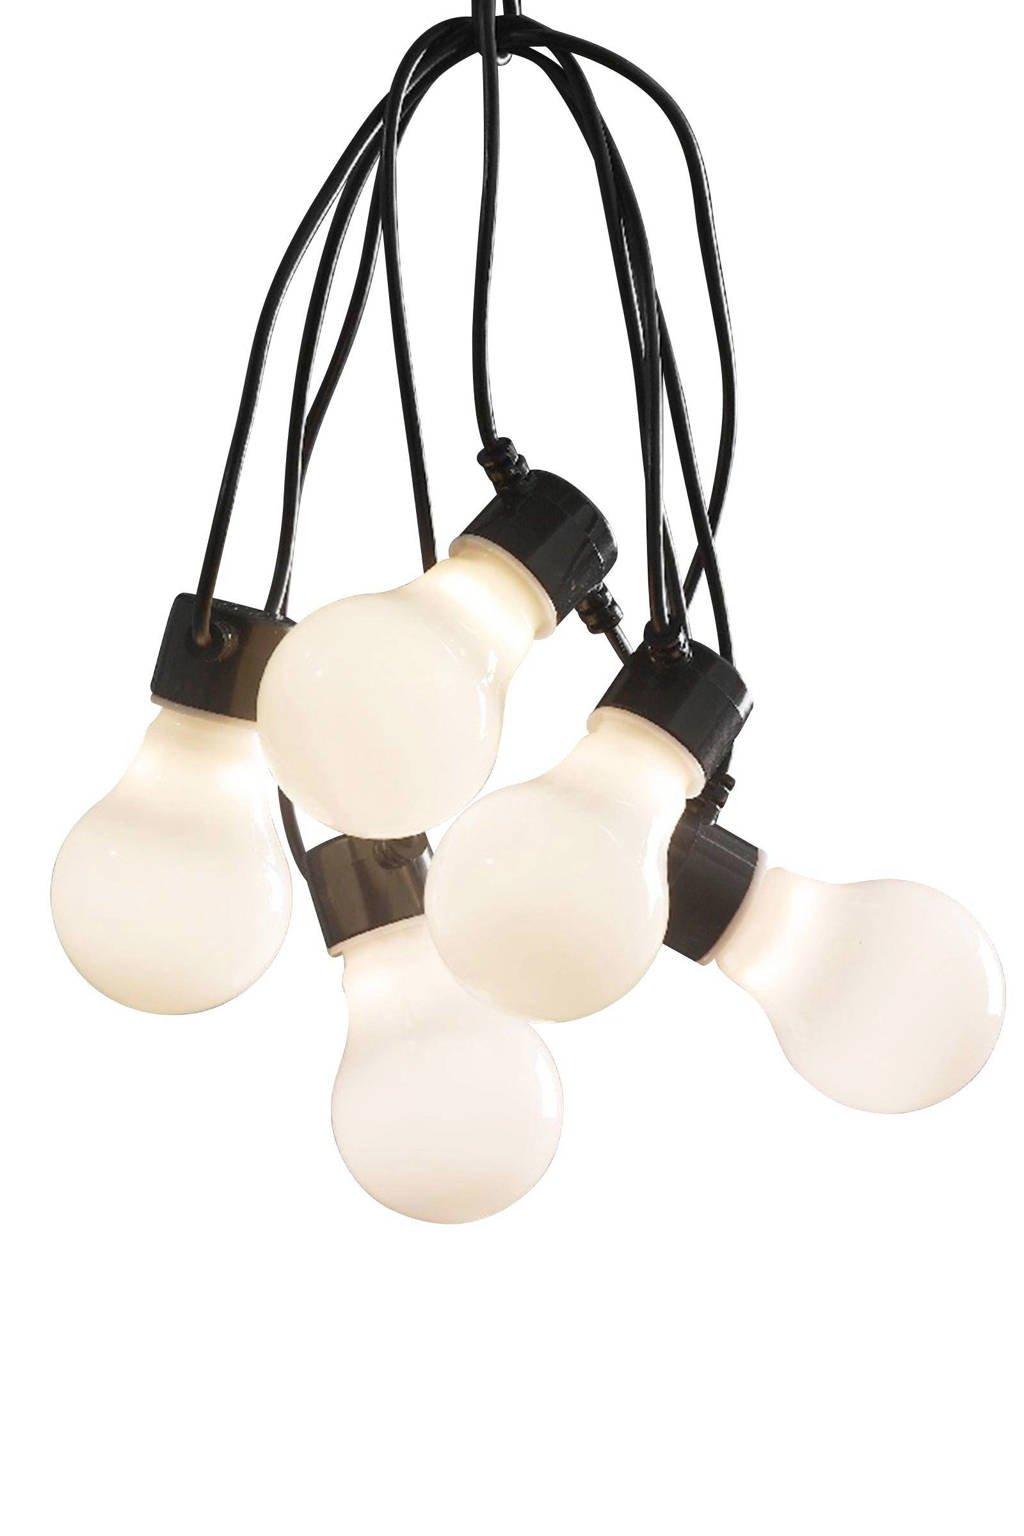 Konstsmide 24V lichtsnoer (10 lampen), 14.5 m, Opaal, zwart